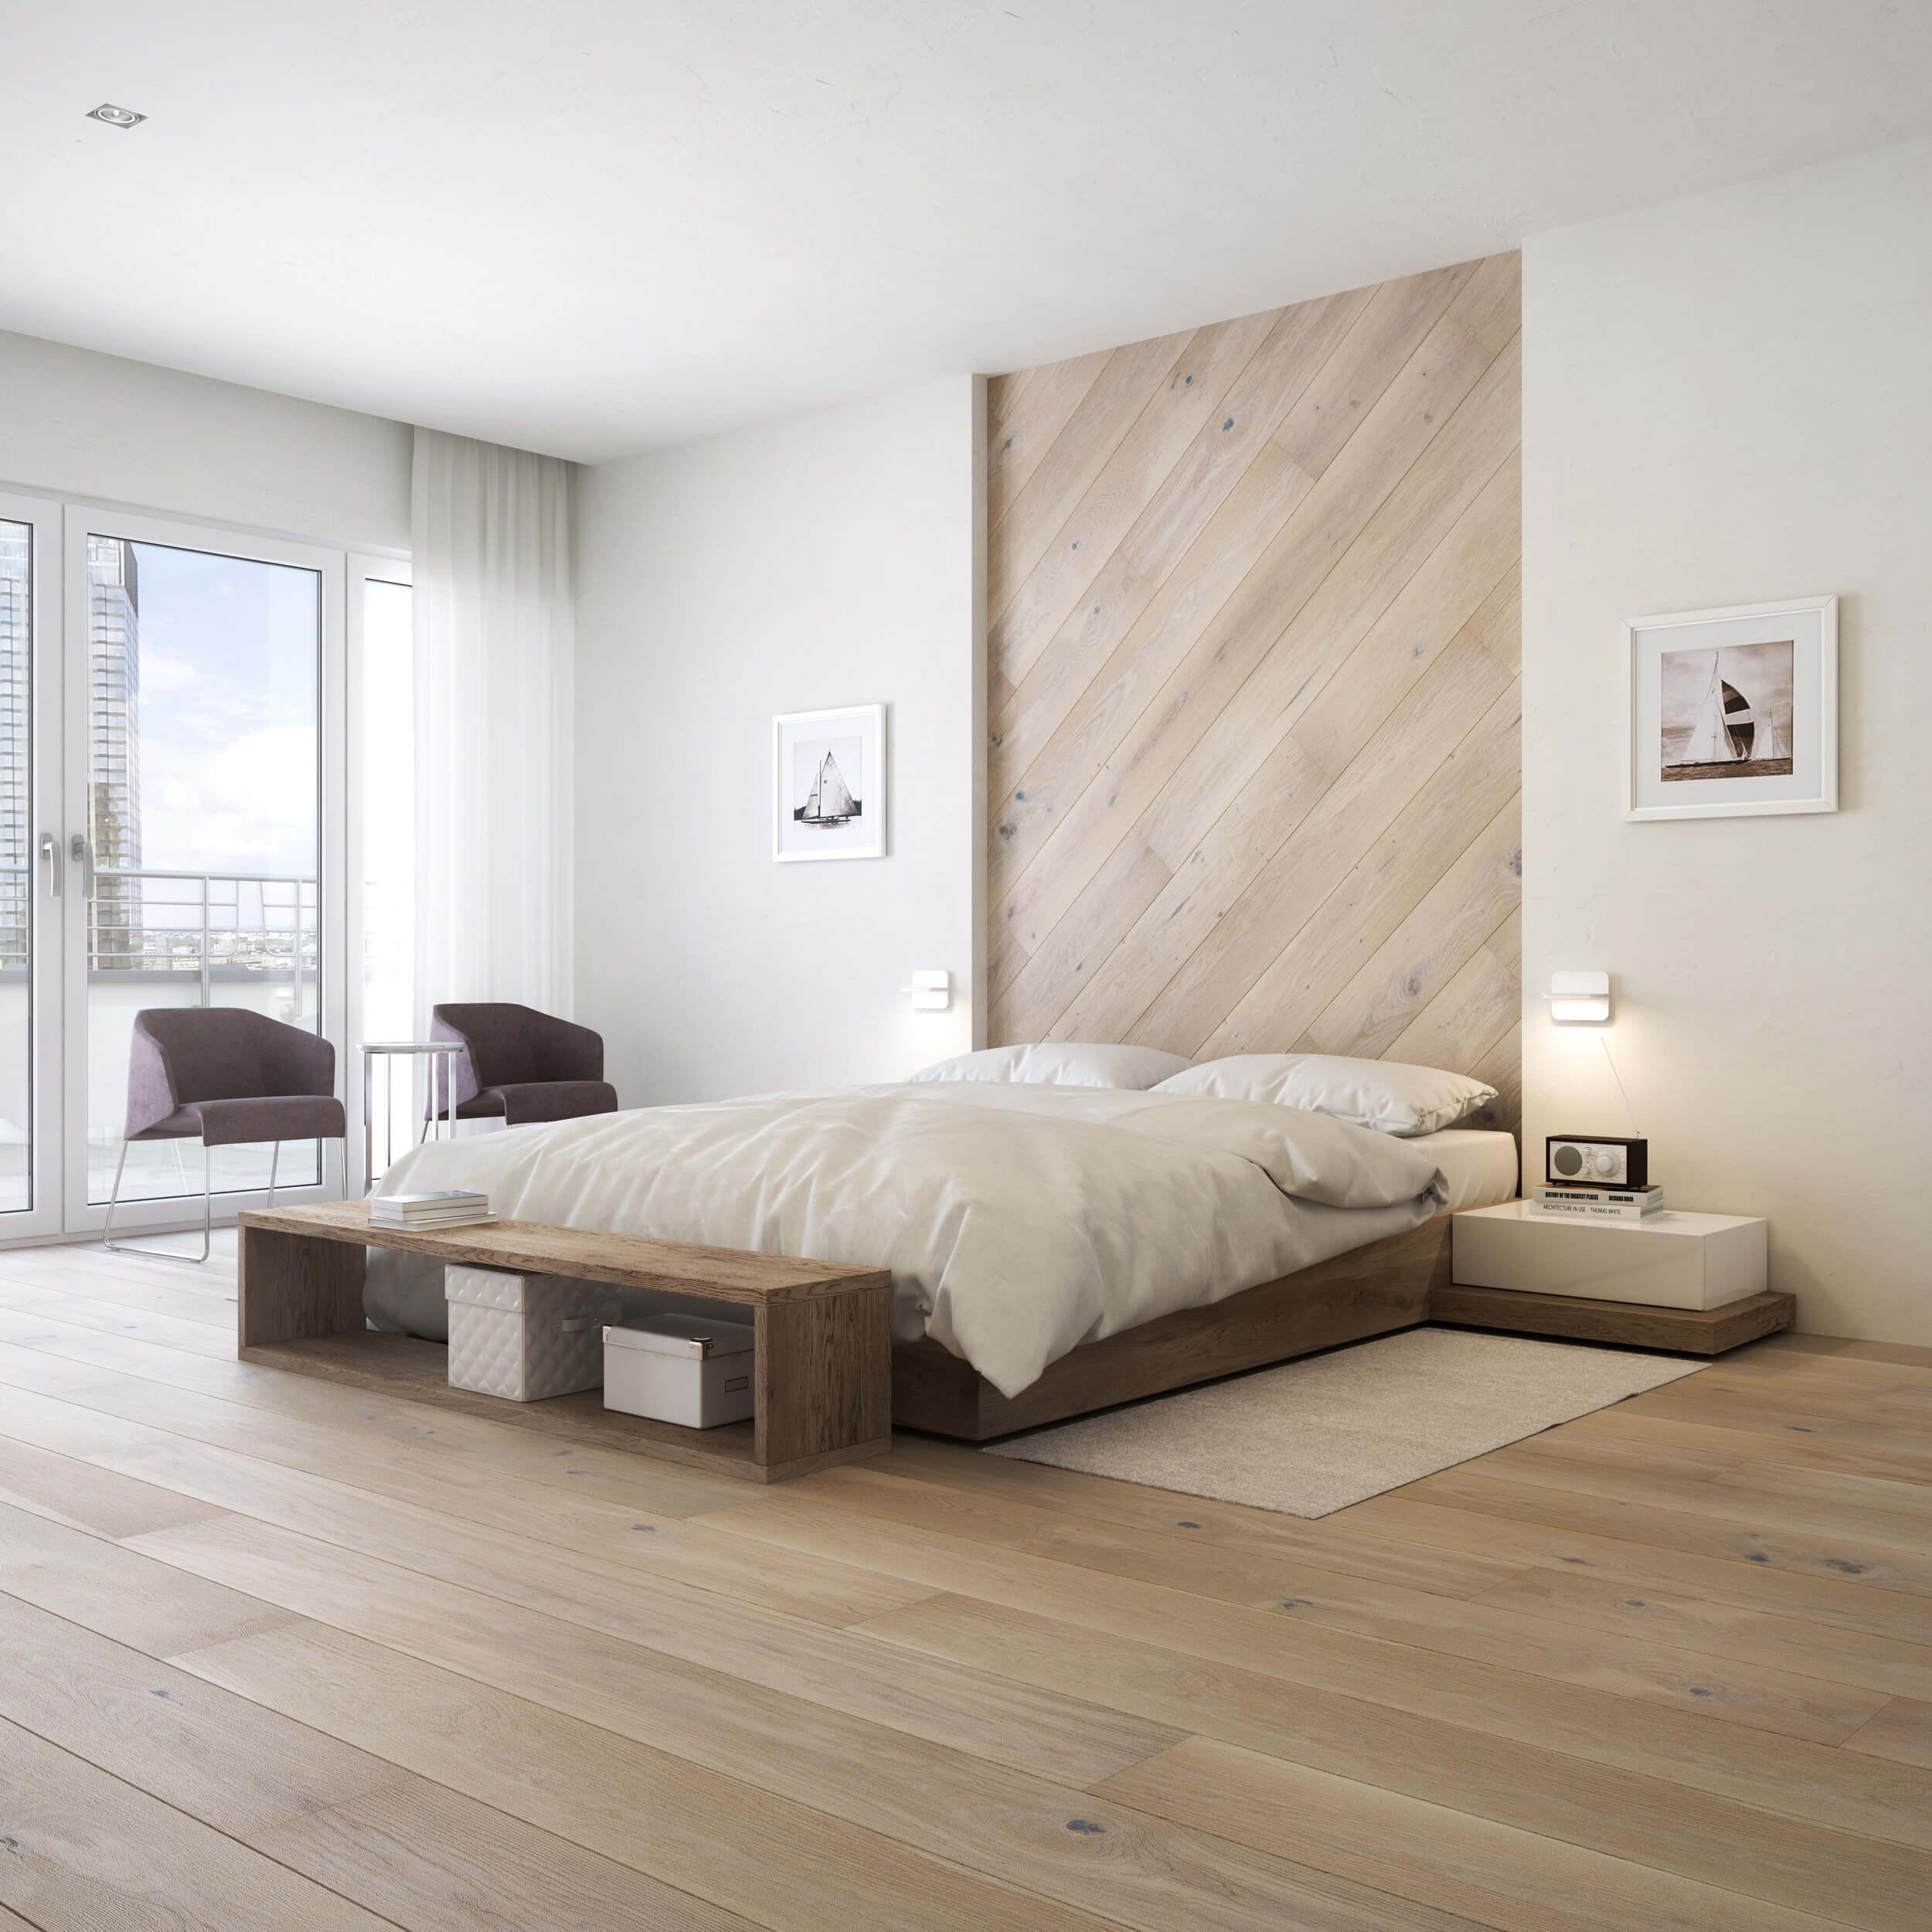 Miegamojo kambario interjeras mano siena for New design hotels 2016